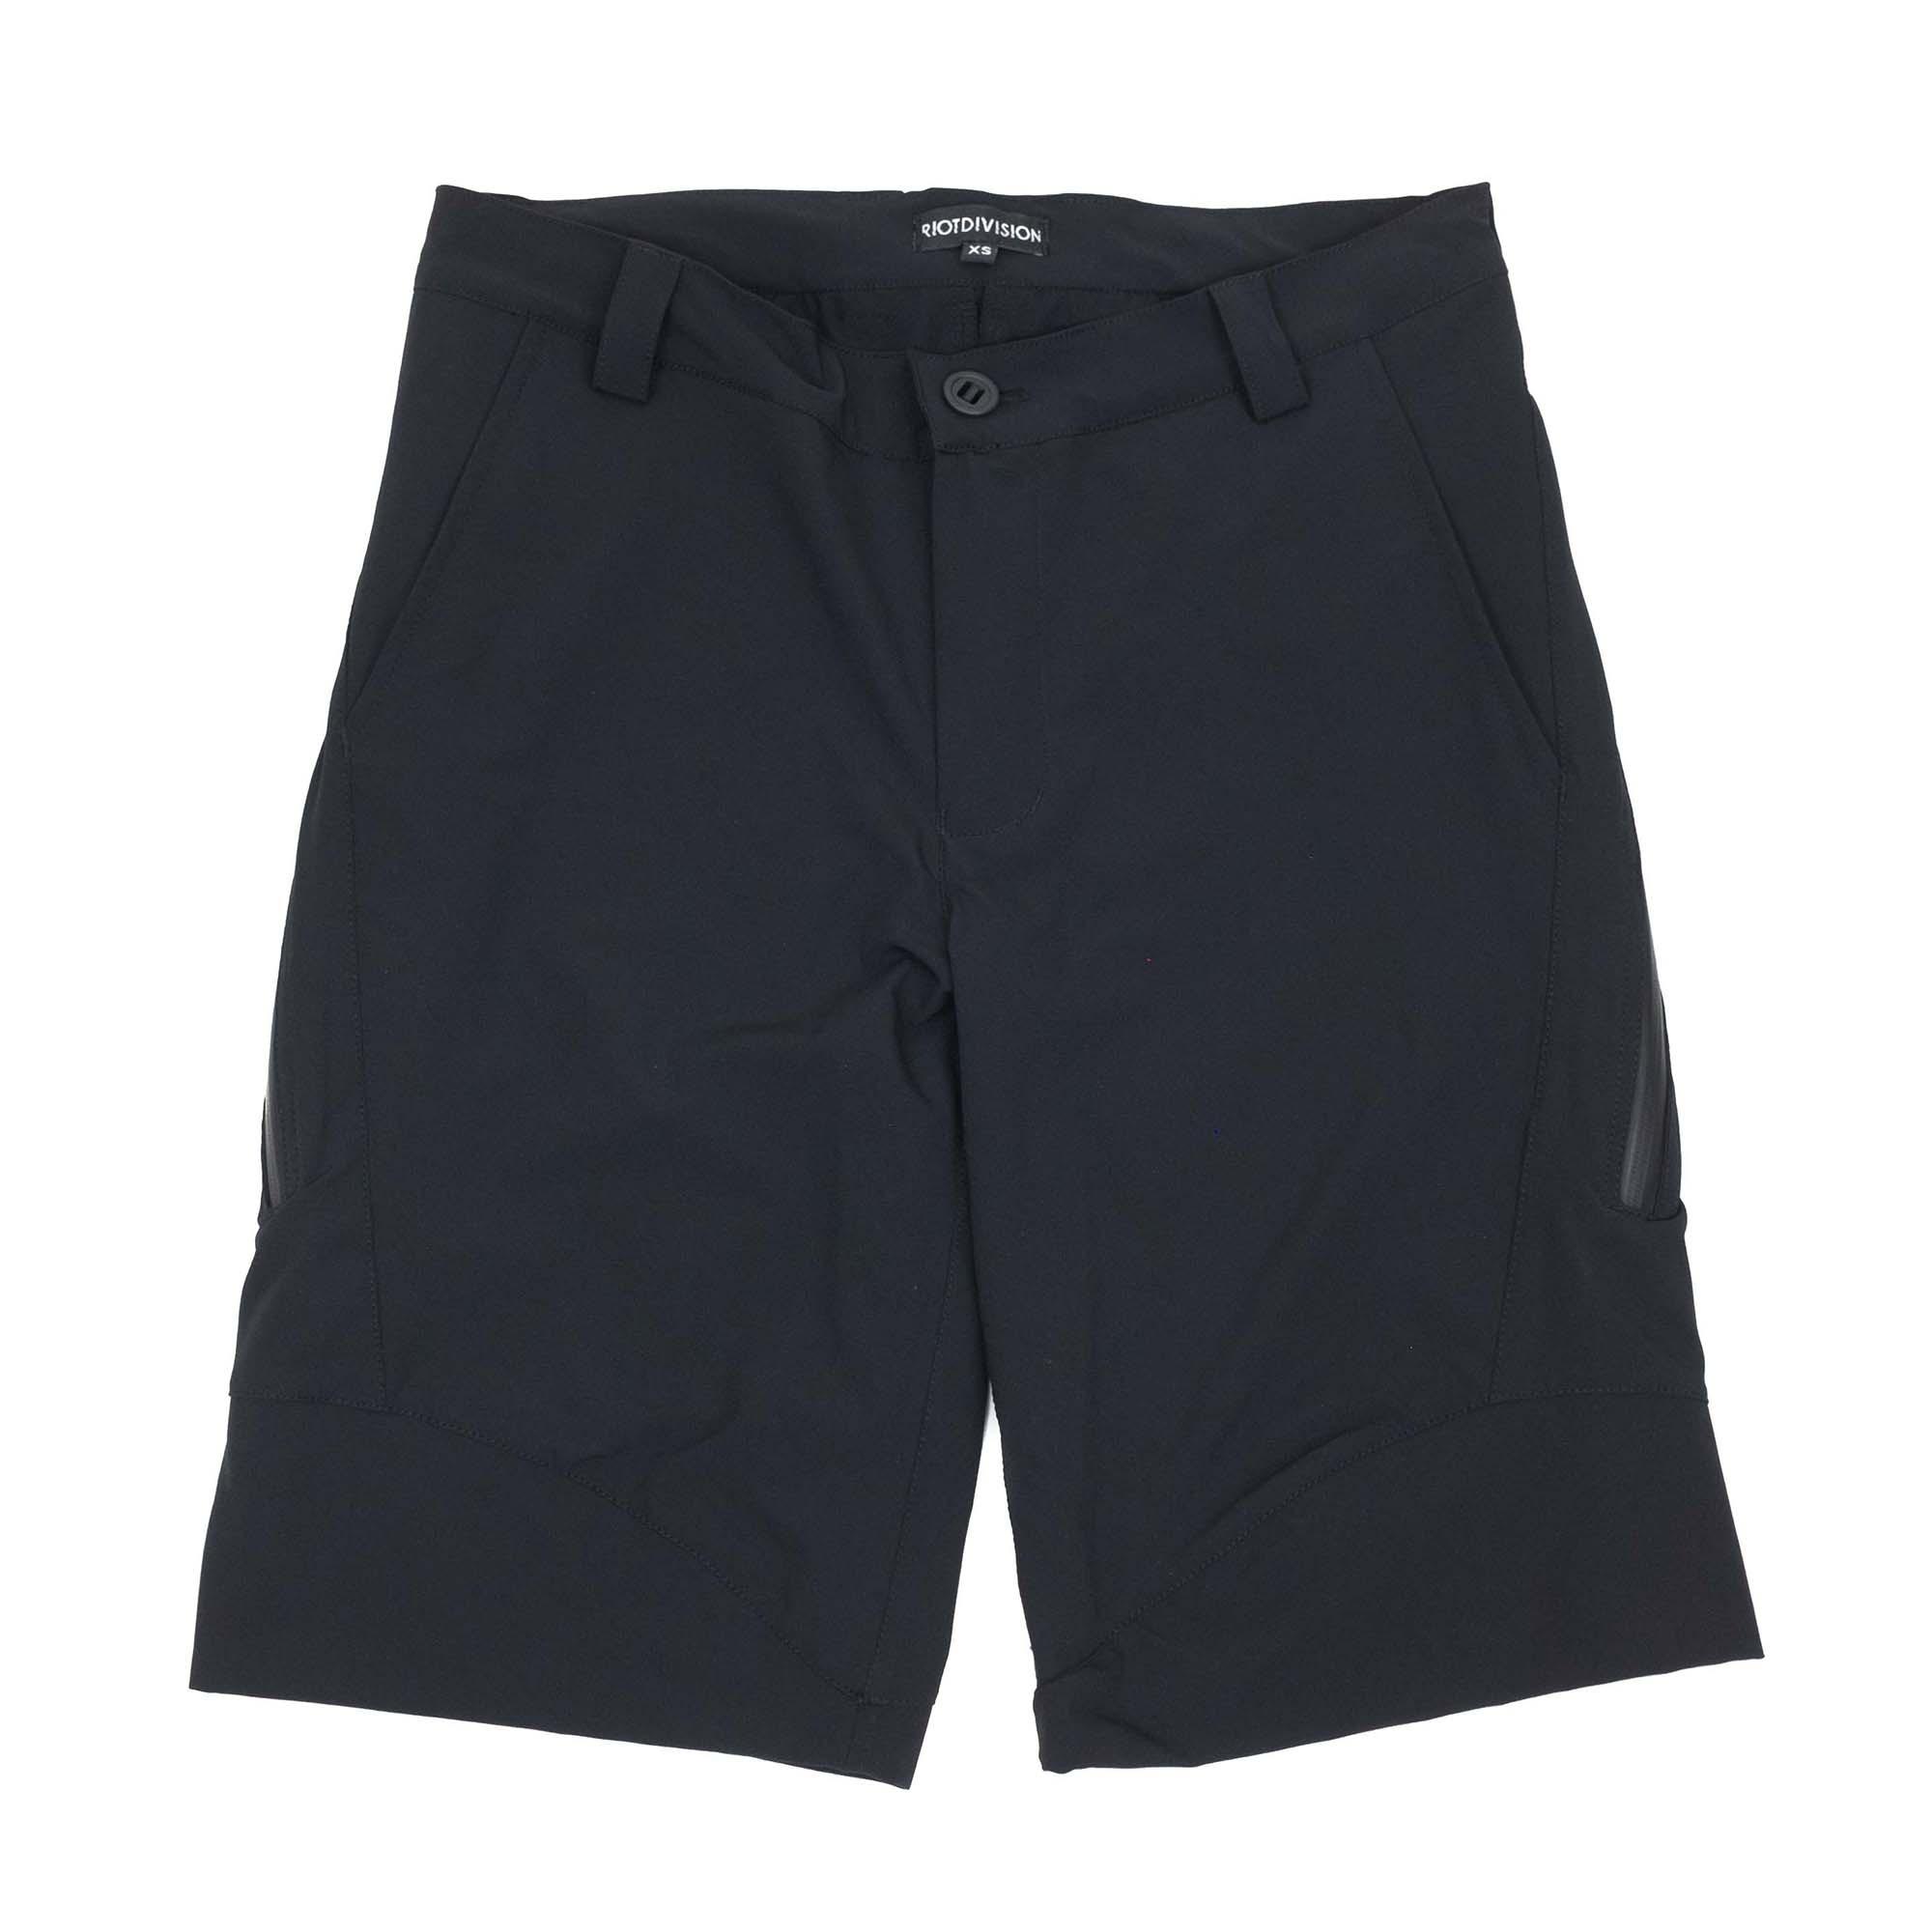 Riot Division Concealed Shorts - Black